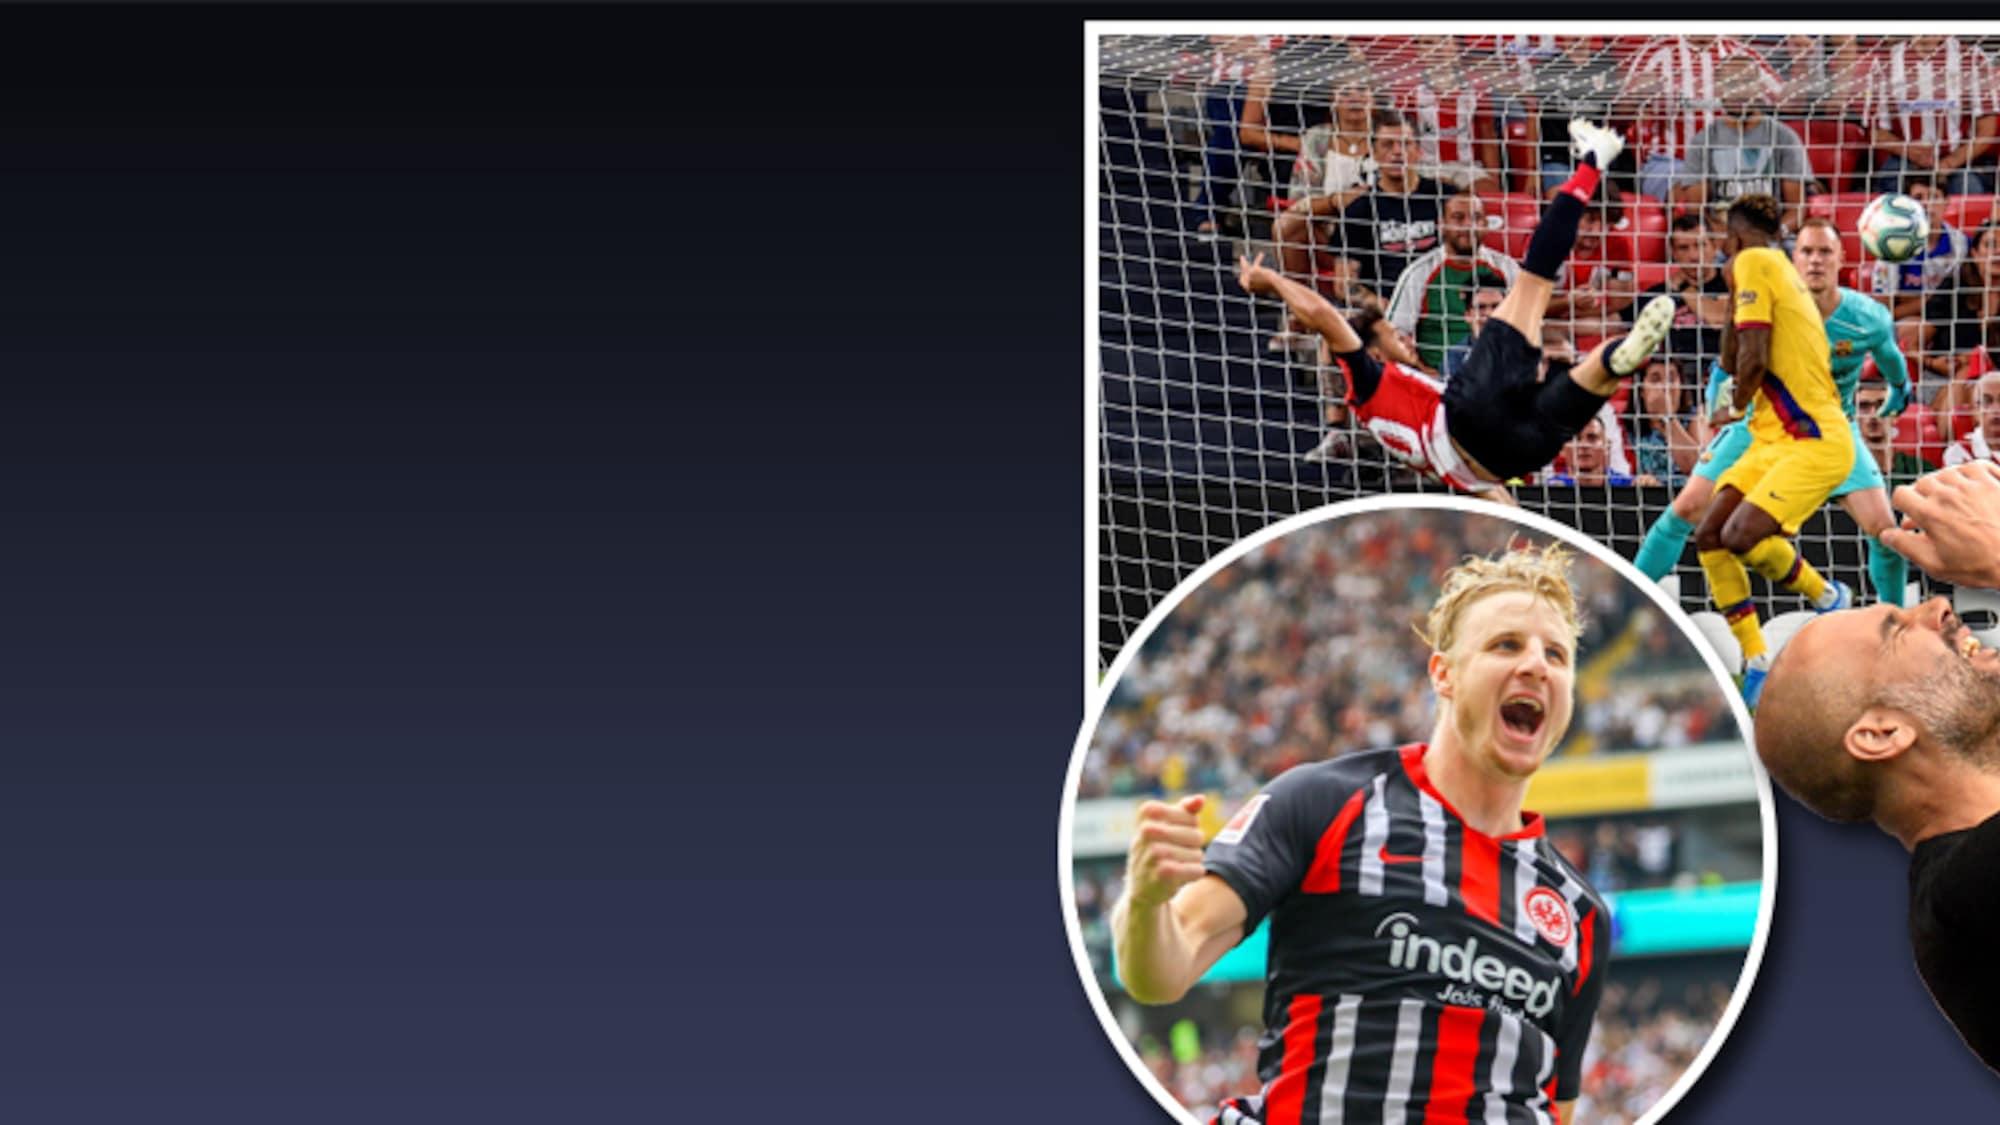 Fünf verrückte Fussball-Momente aus Europa: 38-Jähriger lässt Baskenland ausrasten